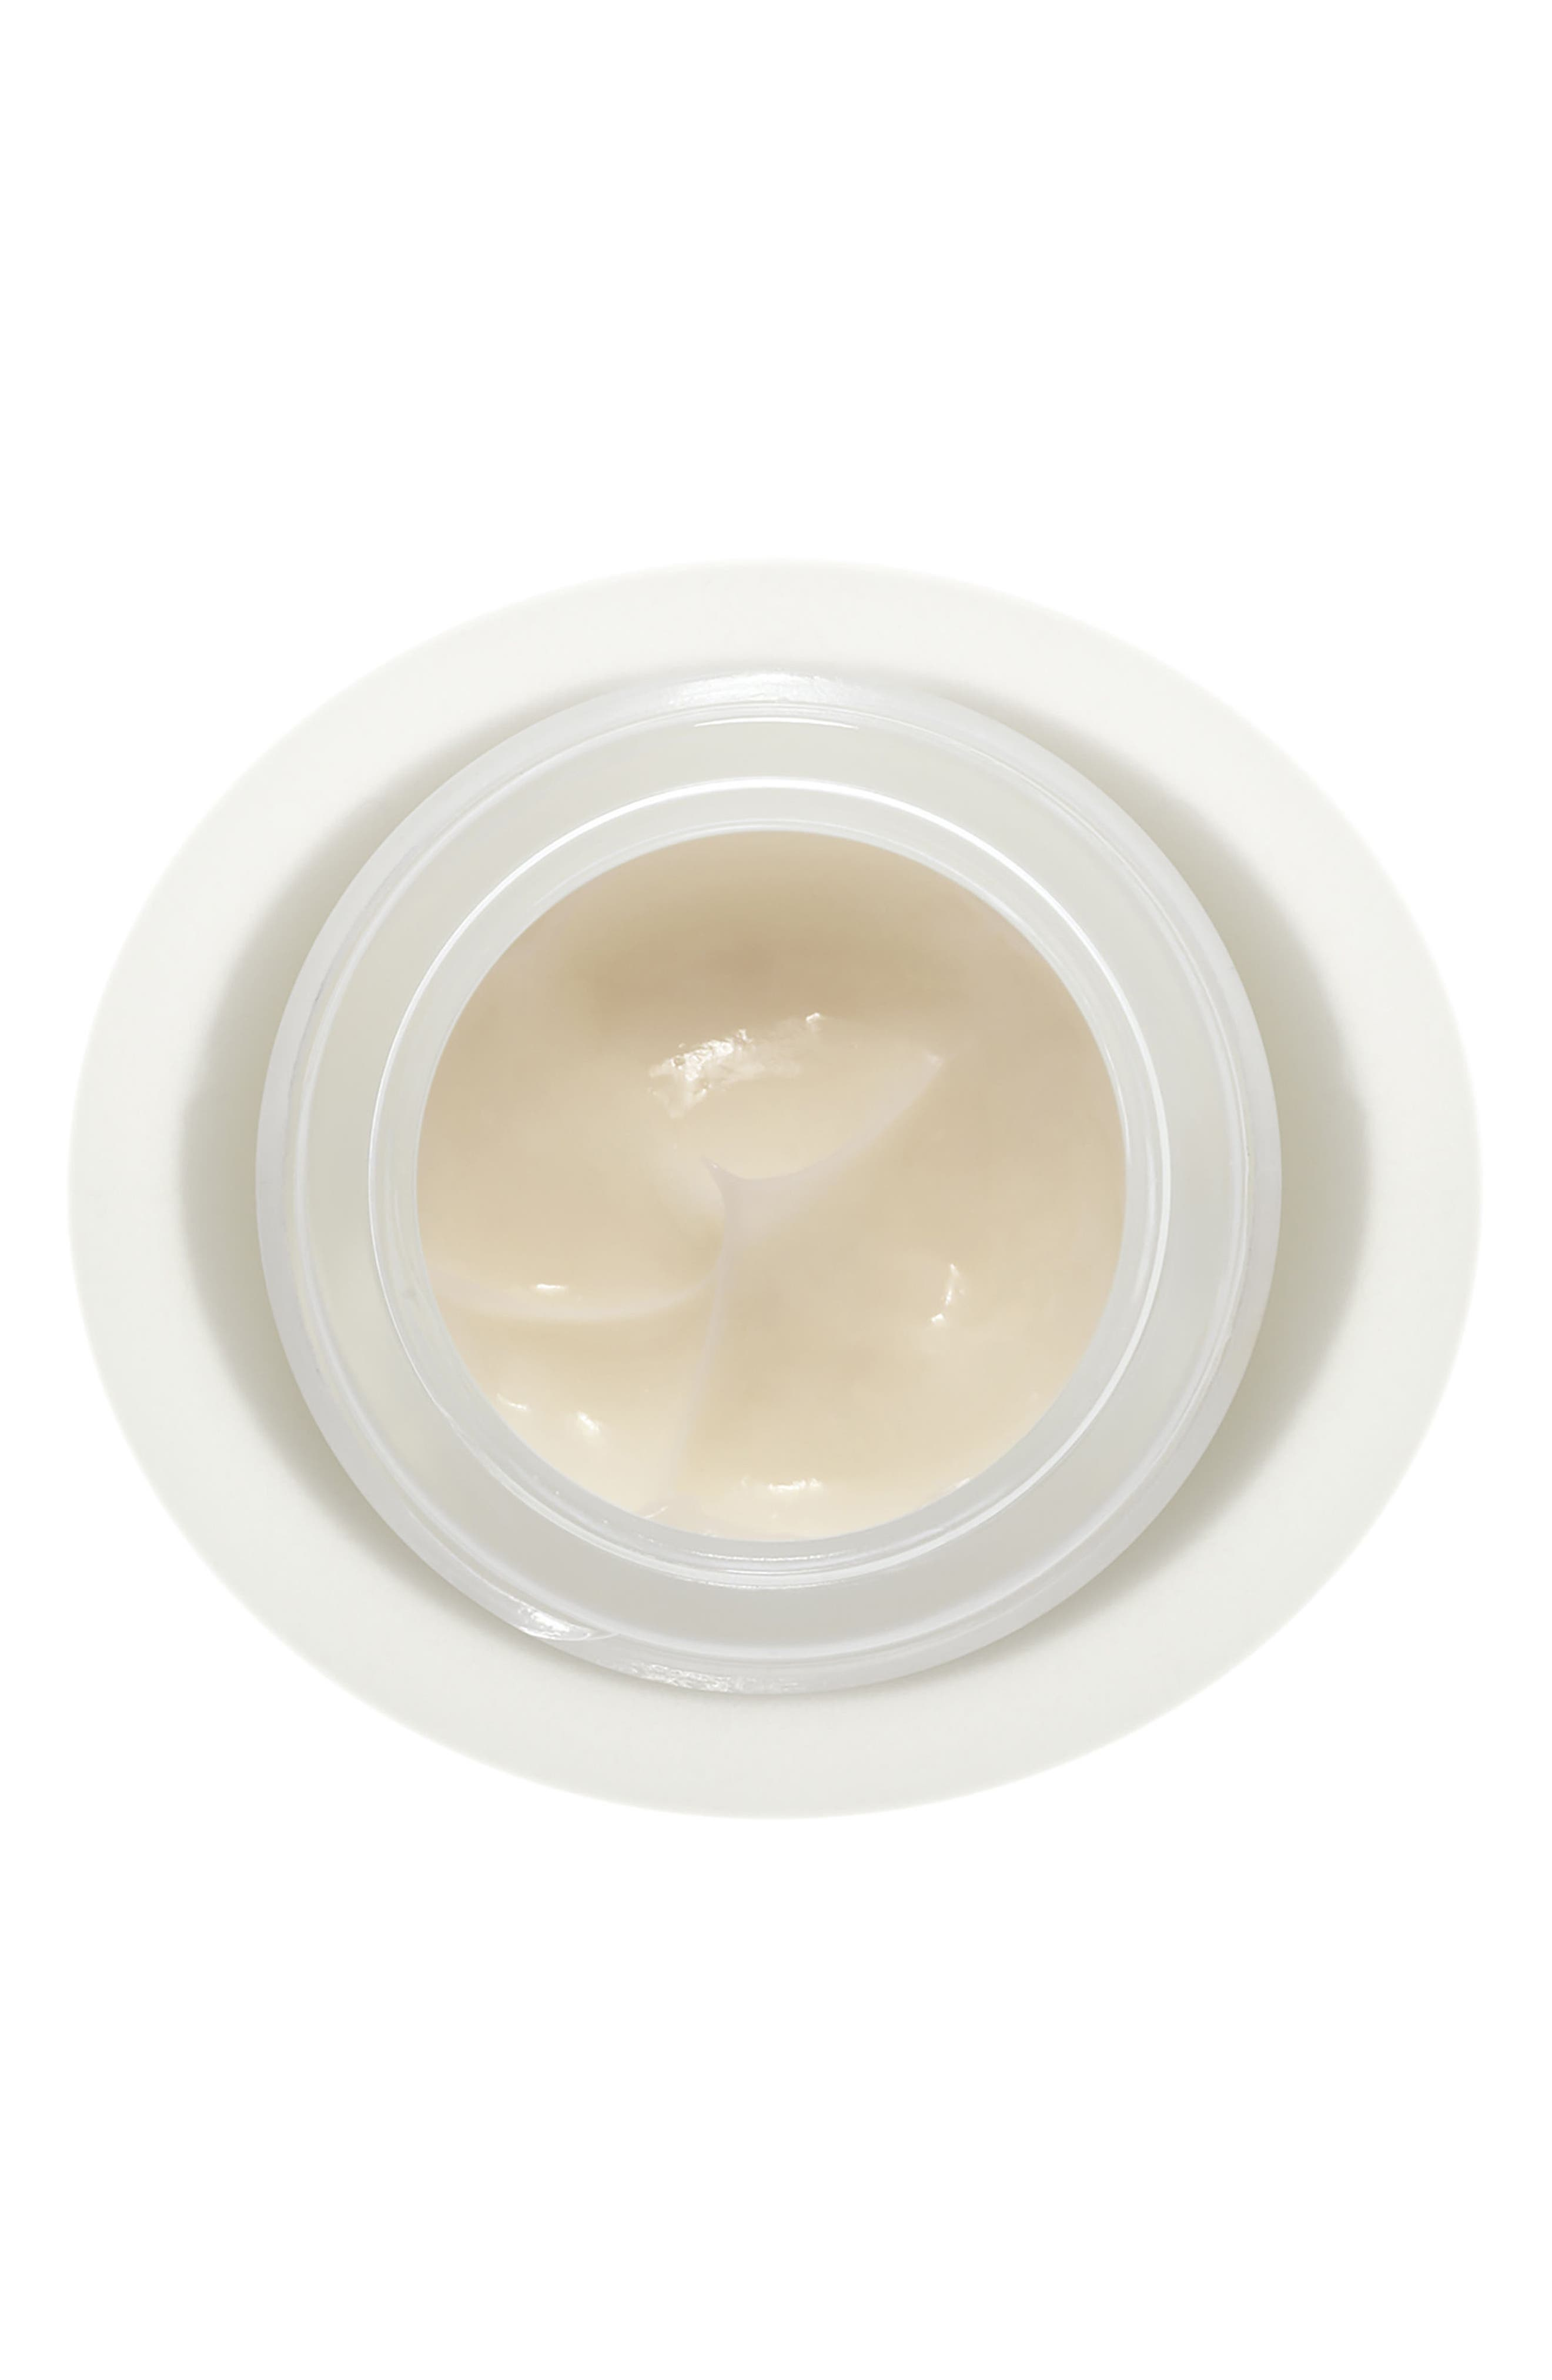 Alternate Image 2  - Clarins Extra-Firming Eye Wrinkle Smoothing Cream